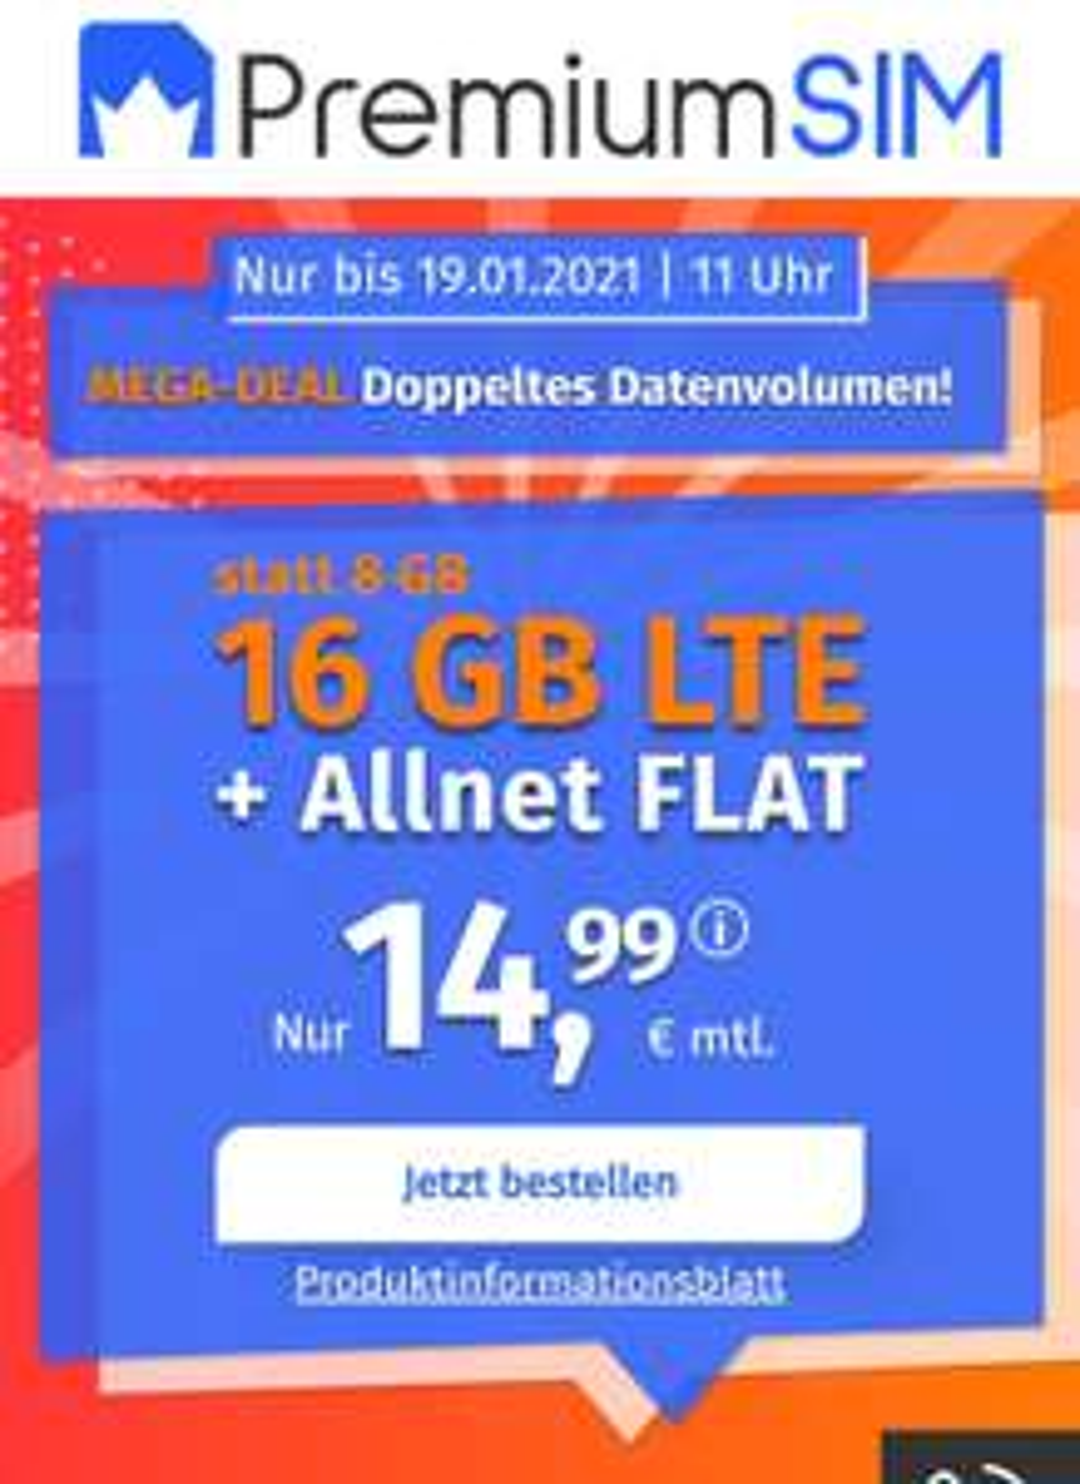 16GB LTE Allnet Flat (monatlich 14,99€)